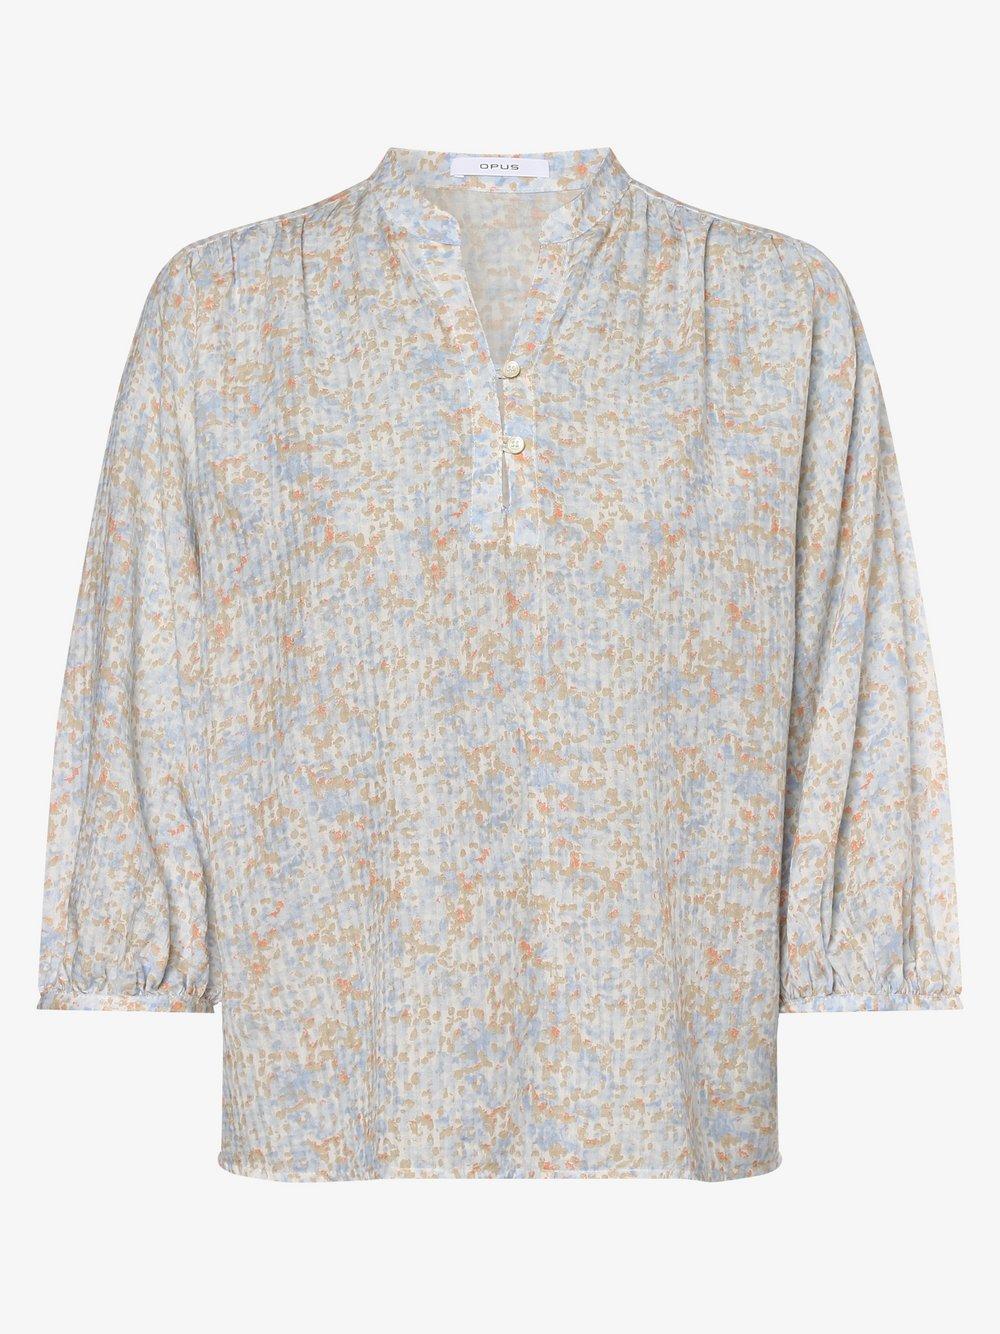 Opus – Bluzka damska – Flanja, niebieski Van Graaf 475137-0001-00440